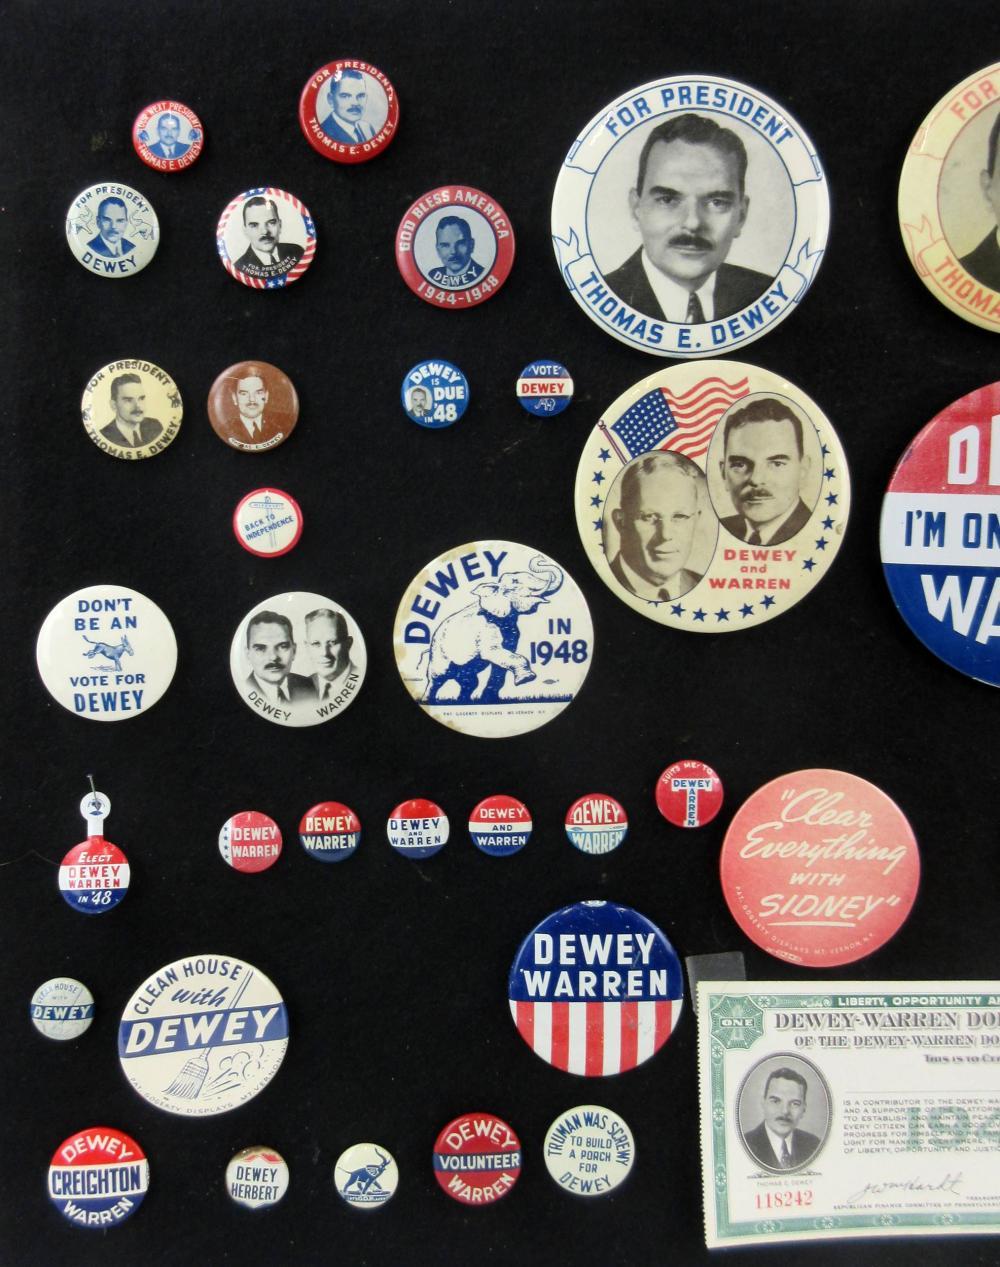 Thomas E. Dewey Campaign Pinbacks & Memorabilia, 60 Pcs